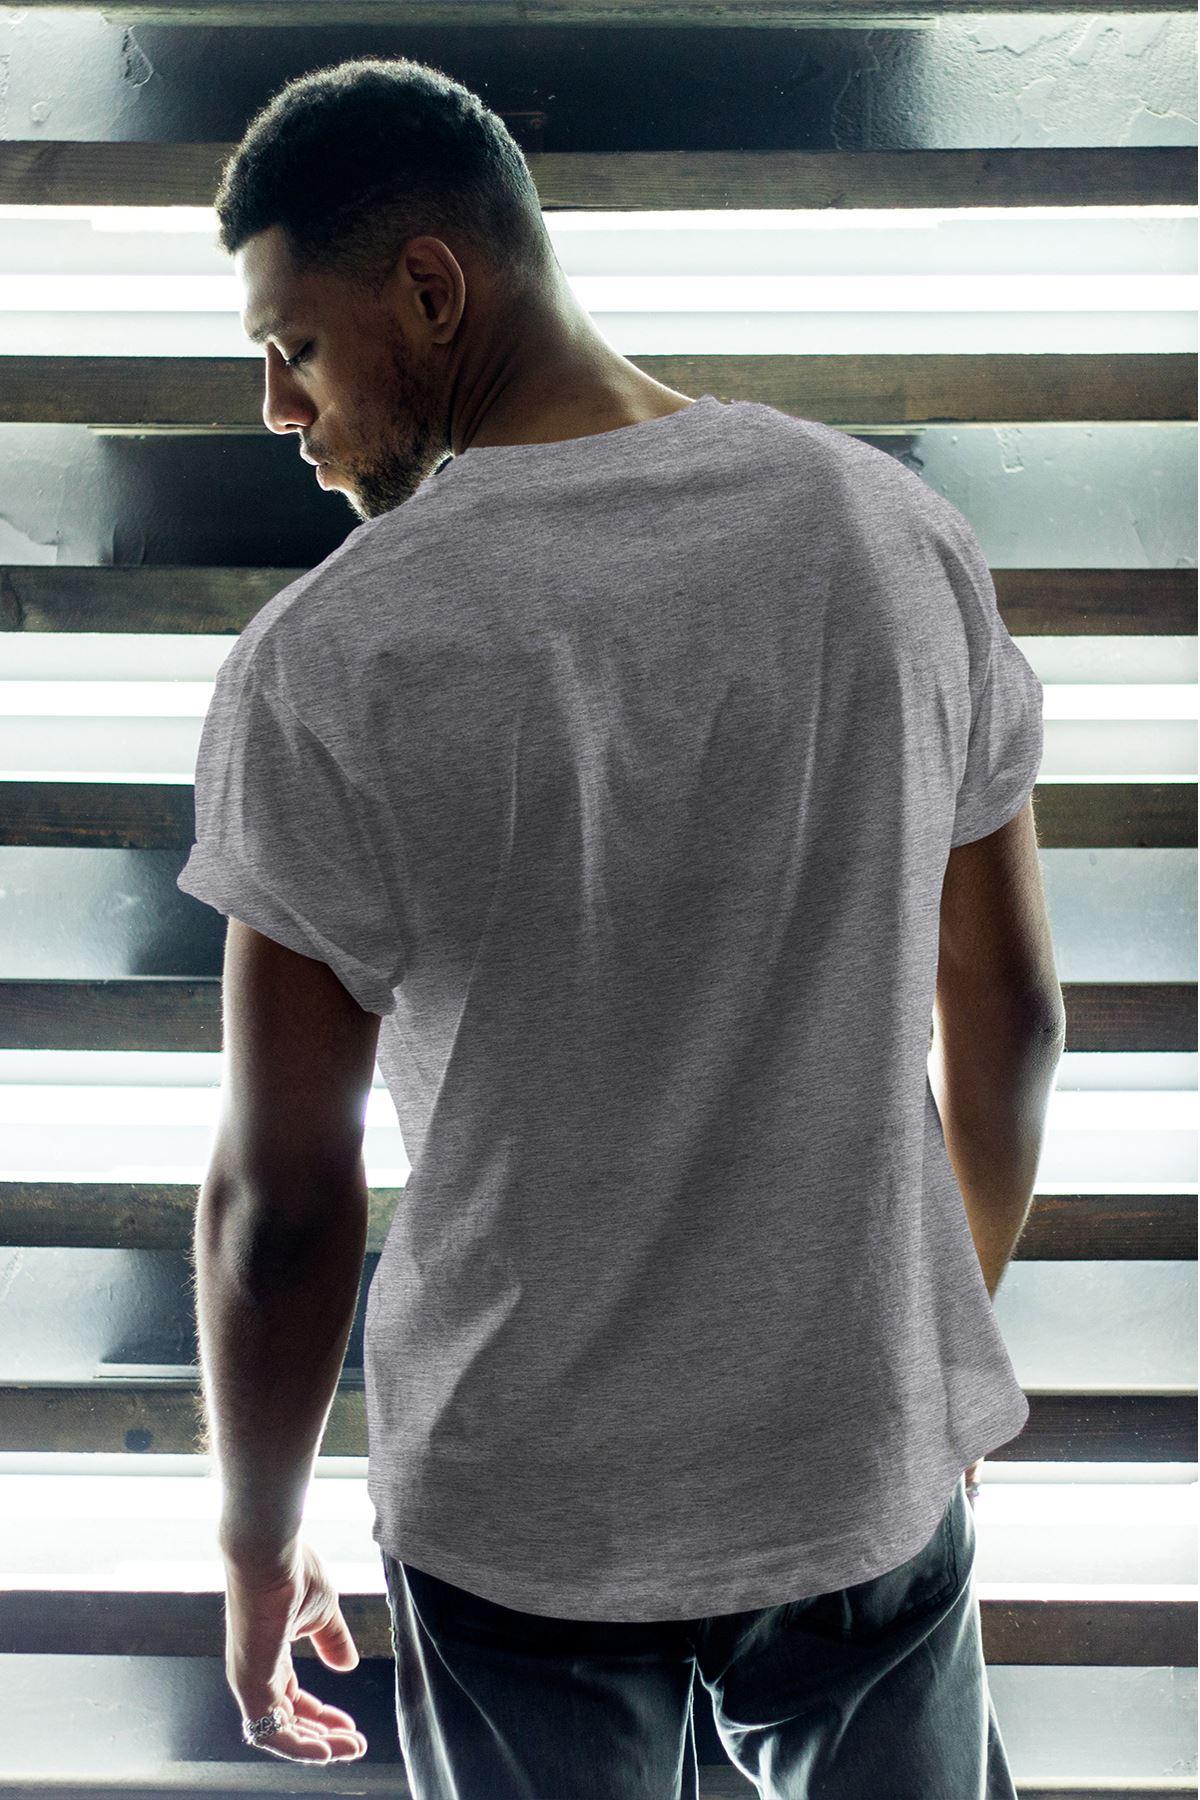 Chicago Bulls 38 Gri Erkek Oversize Tshirt - Tişört